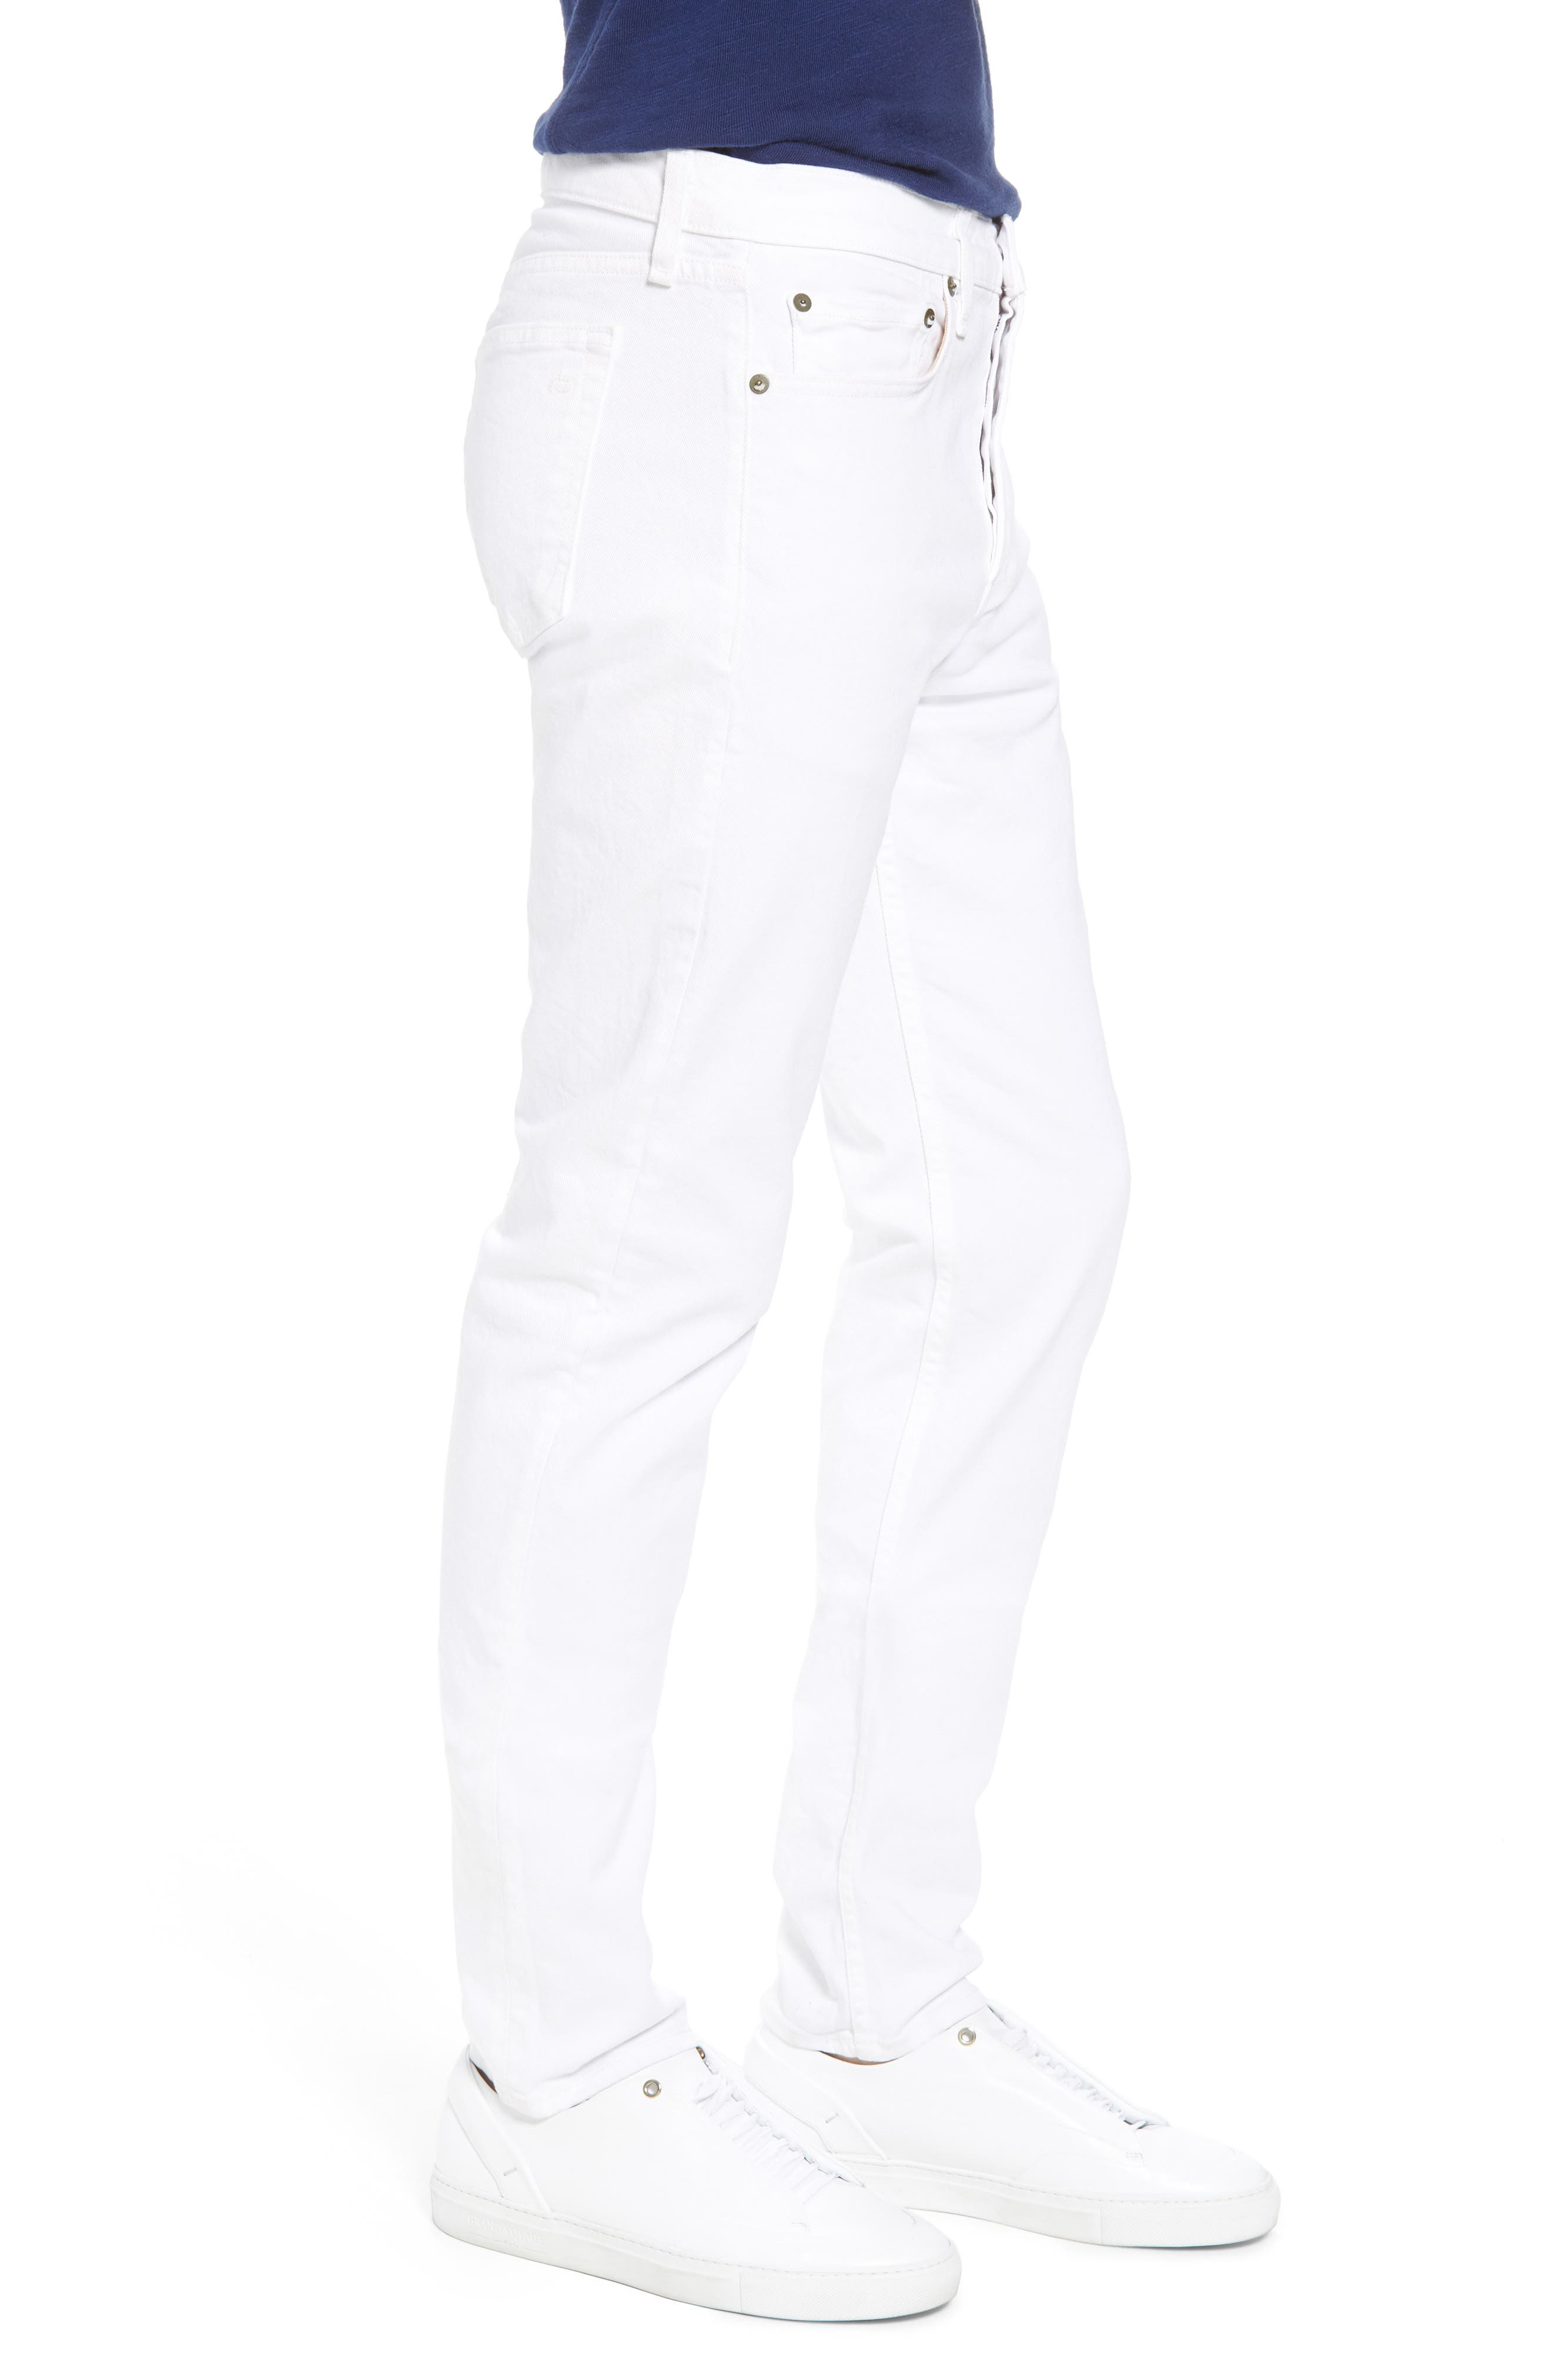 Fit 2 Slim Fit Jeans,                             Alternate thumbnail 3, color,                             White